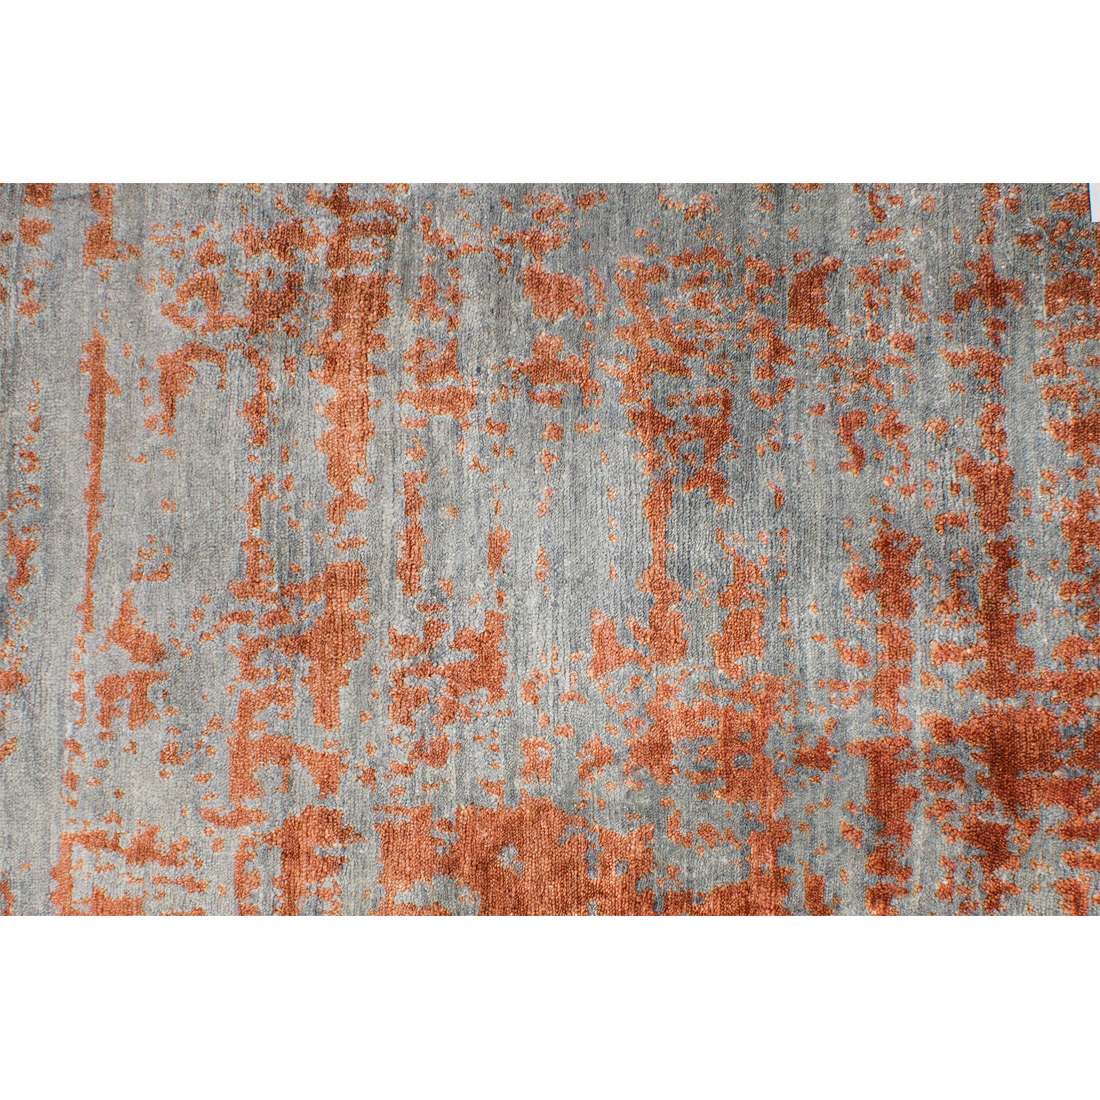 Vloerkleed Xilento Bamboo Grey Orange | 200 x 300 cm